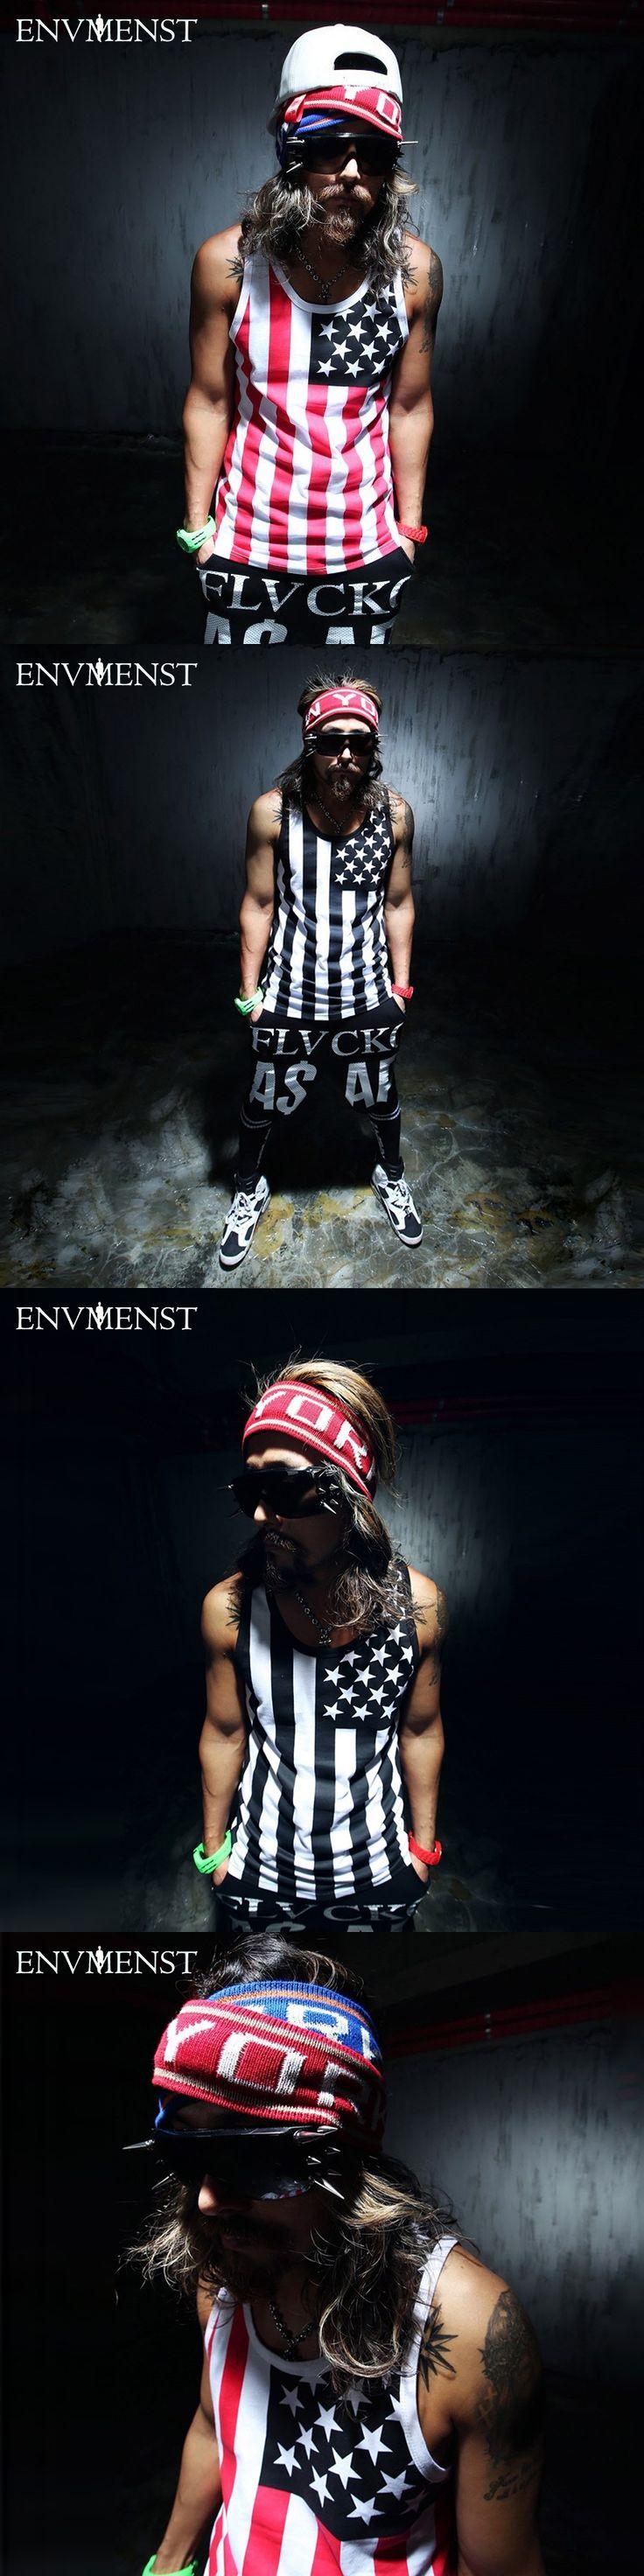 2017 Envmenst Newest Brand Shark Men Cotton Tank Tops Vest Men' Sleeveless Top Tees Star Stripped Printed  Street Wear Hip Hop